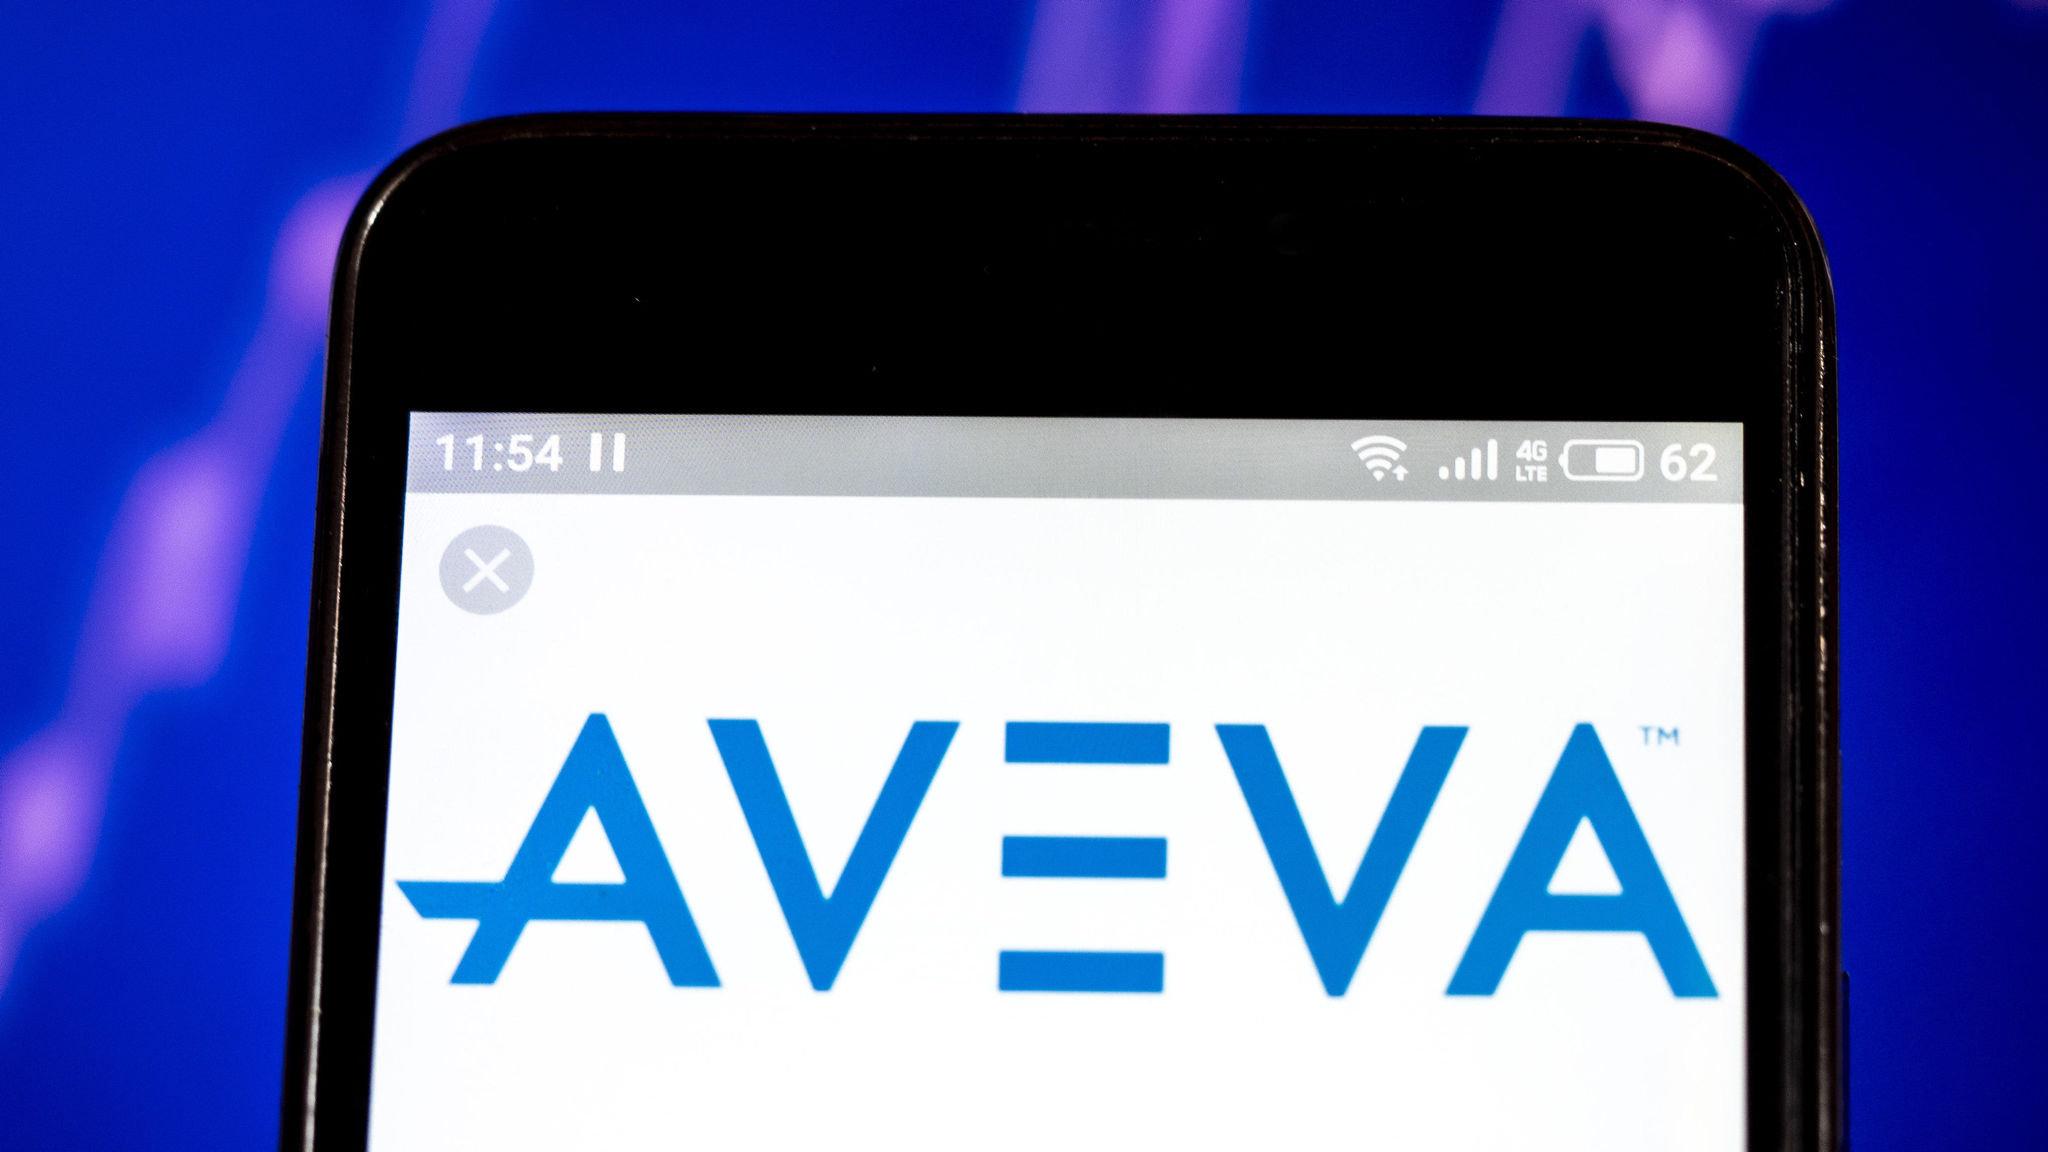 Aveva is next pick for Stealth Stakhanovite index and FTSE